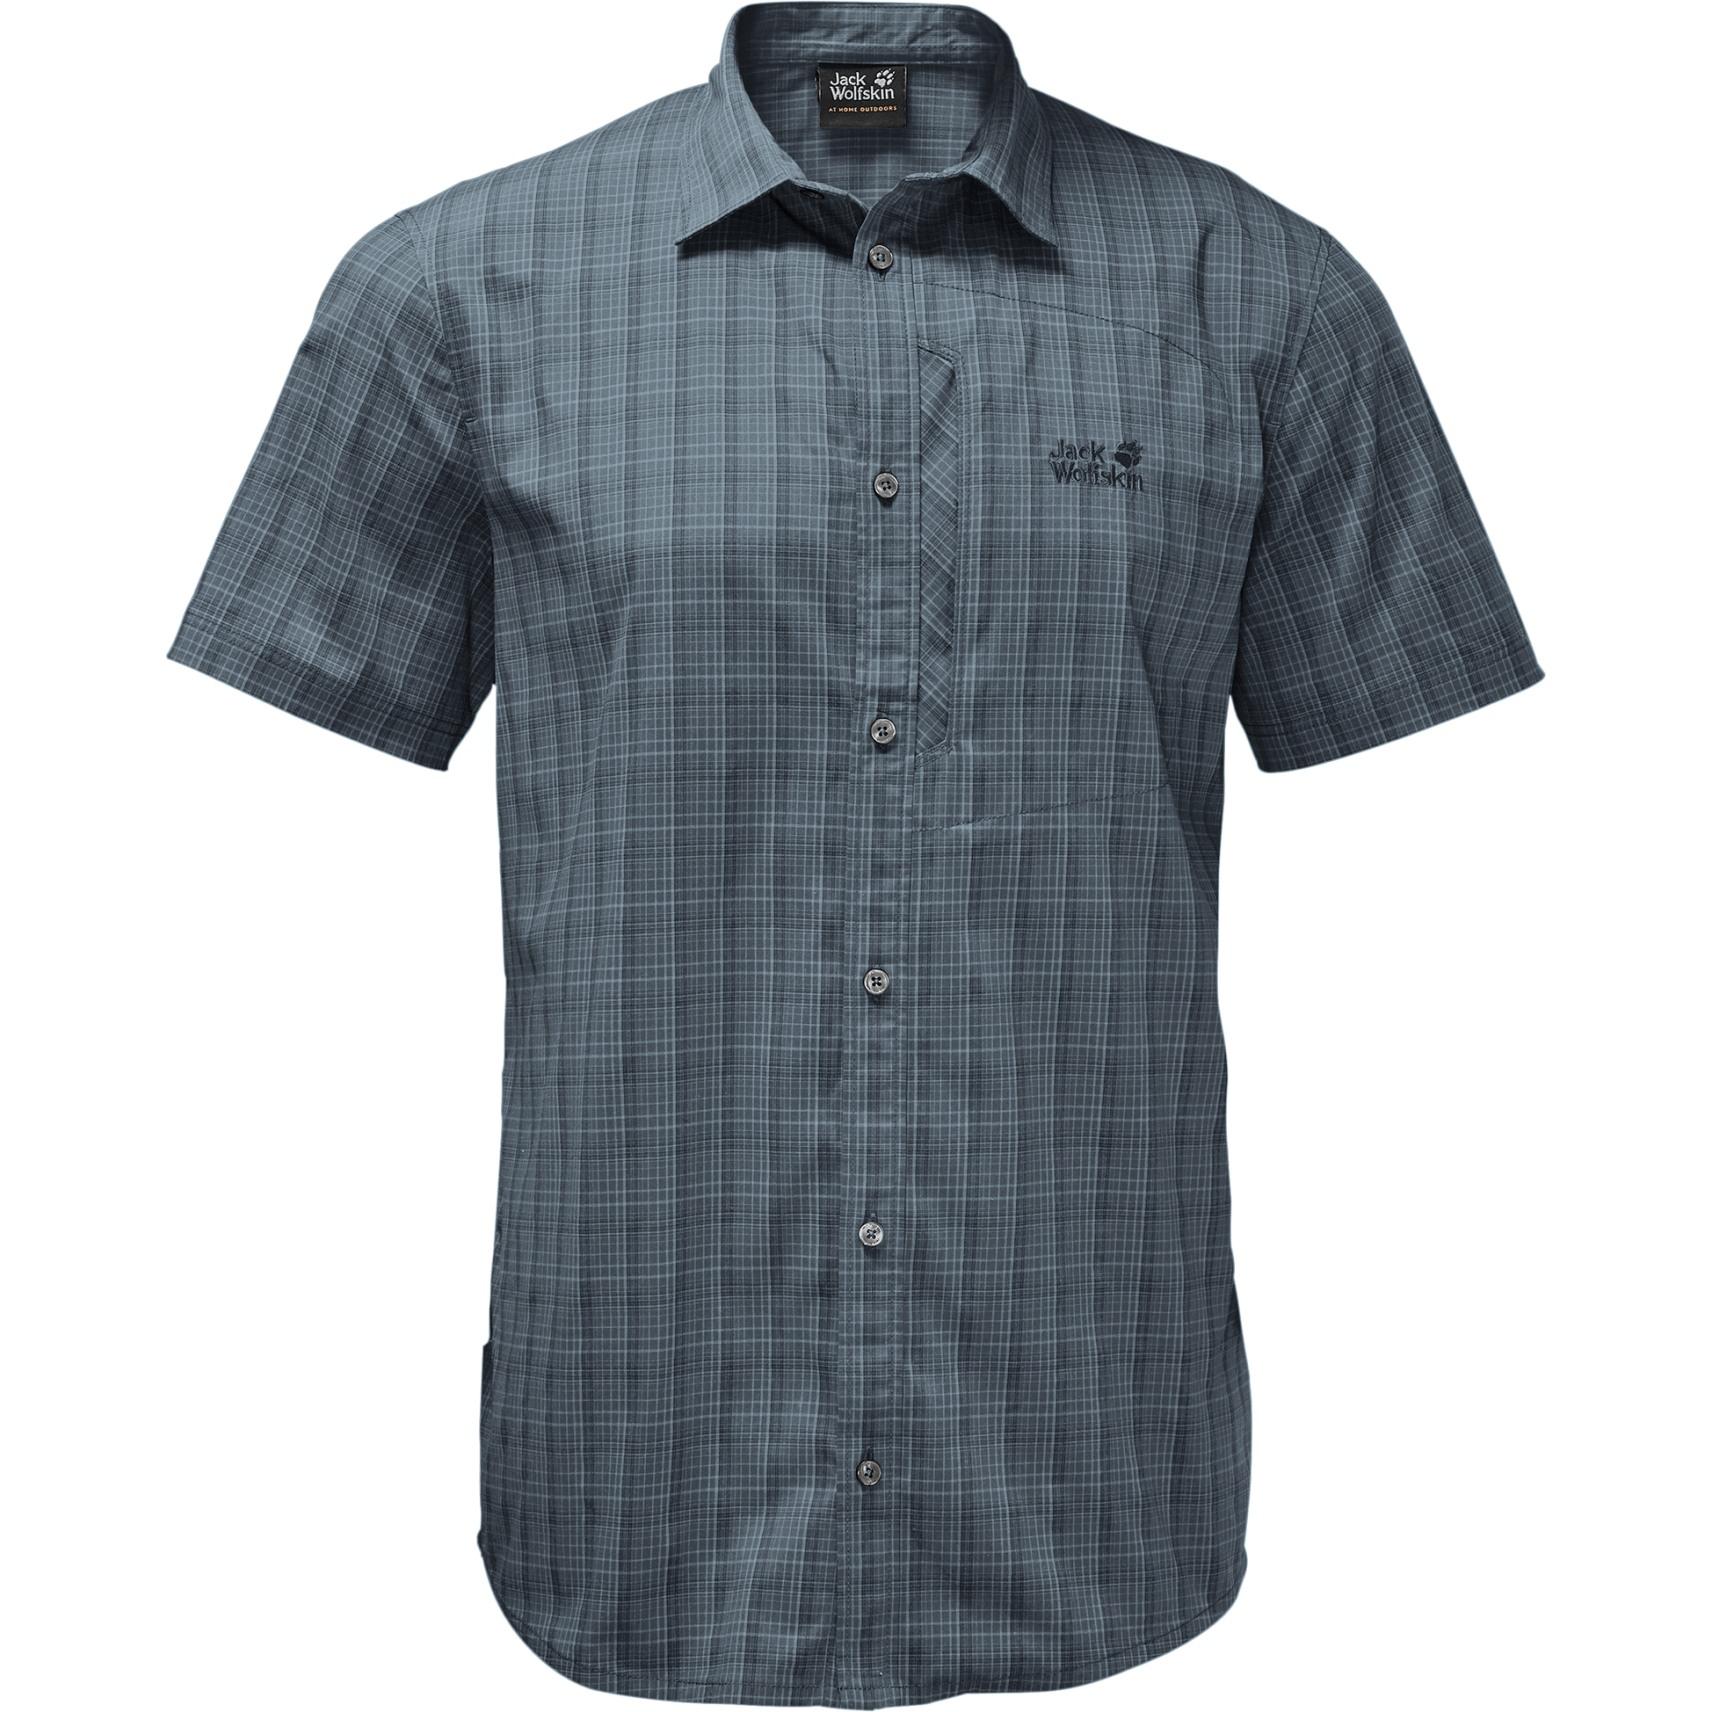 Jack Wolfskin Rays Stretch Vent Shirt Men - storm grey checks